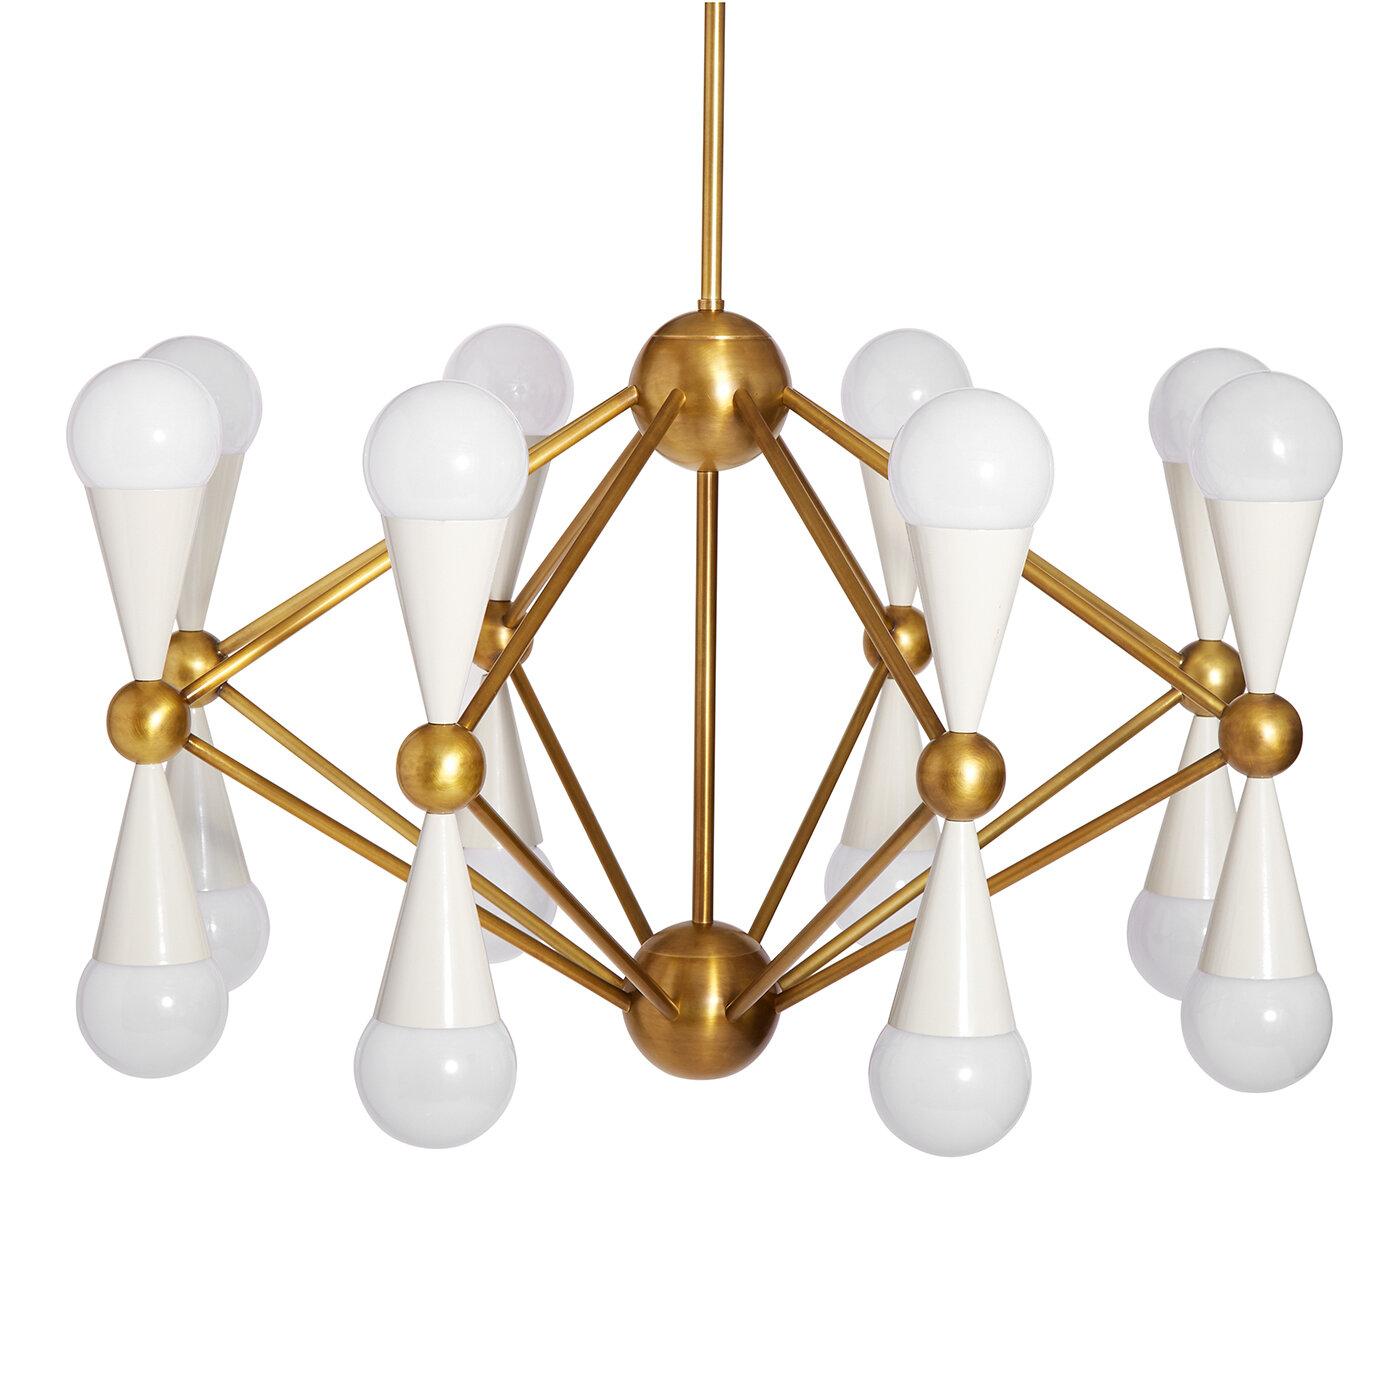 light chandelier top bulb edison looking skookum cheap bulbs fancy lamp old design vintage